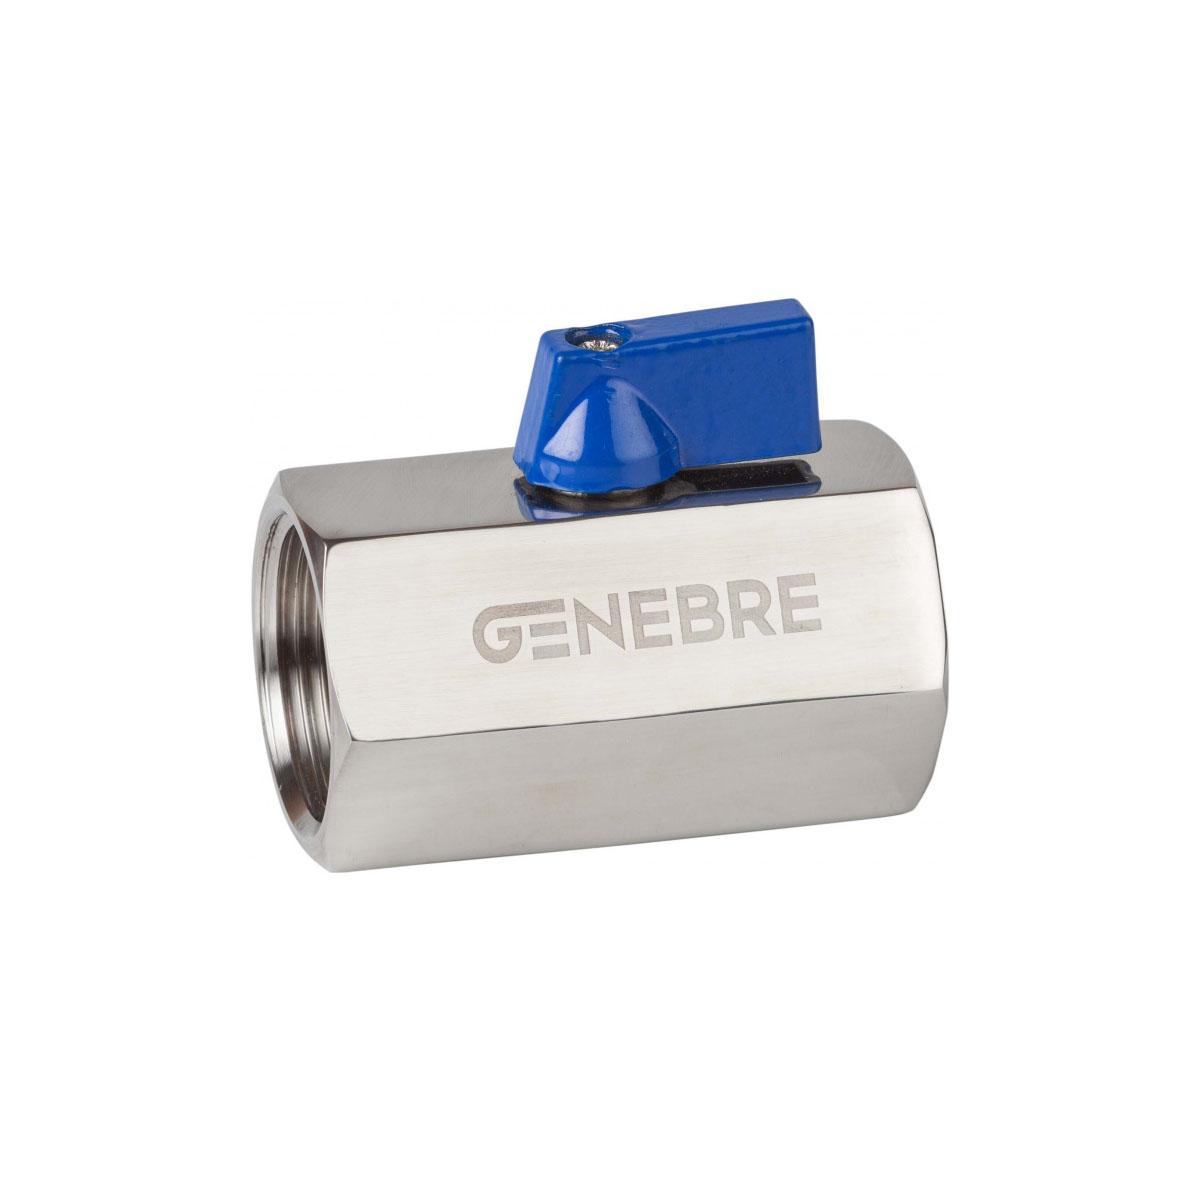 Válvula de esfera monobloco mini inox polido 316 F-F PN 63 BSP 1/4